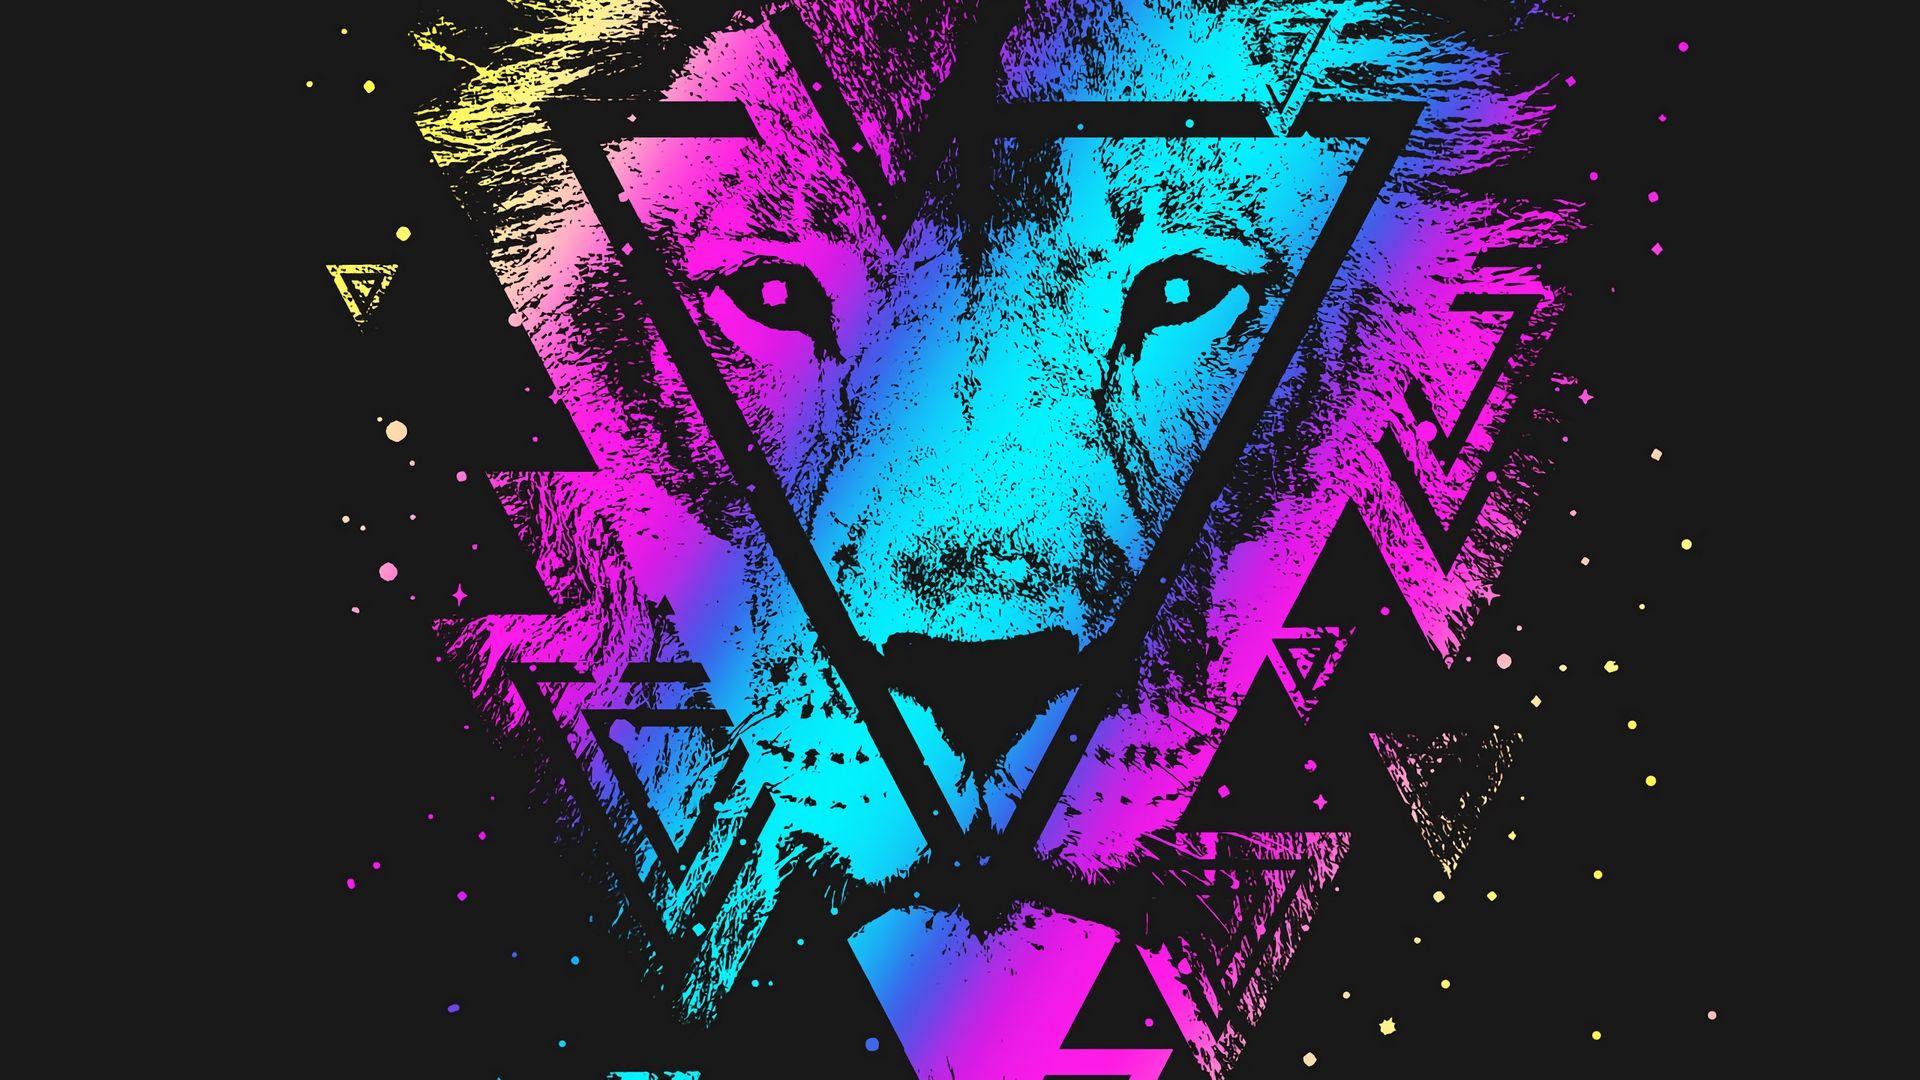 Lion Art Download Wallpaper Image - Lion Colorful - HD Wallpaper